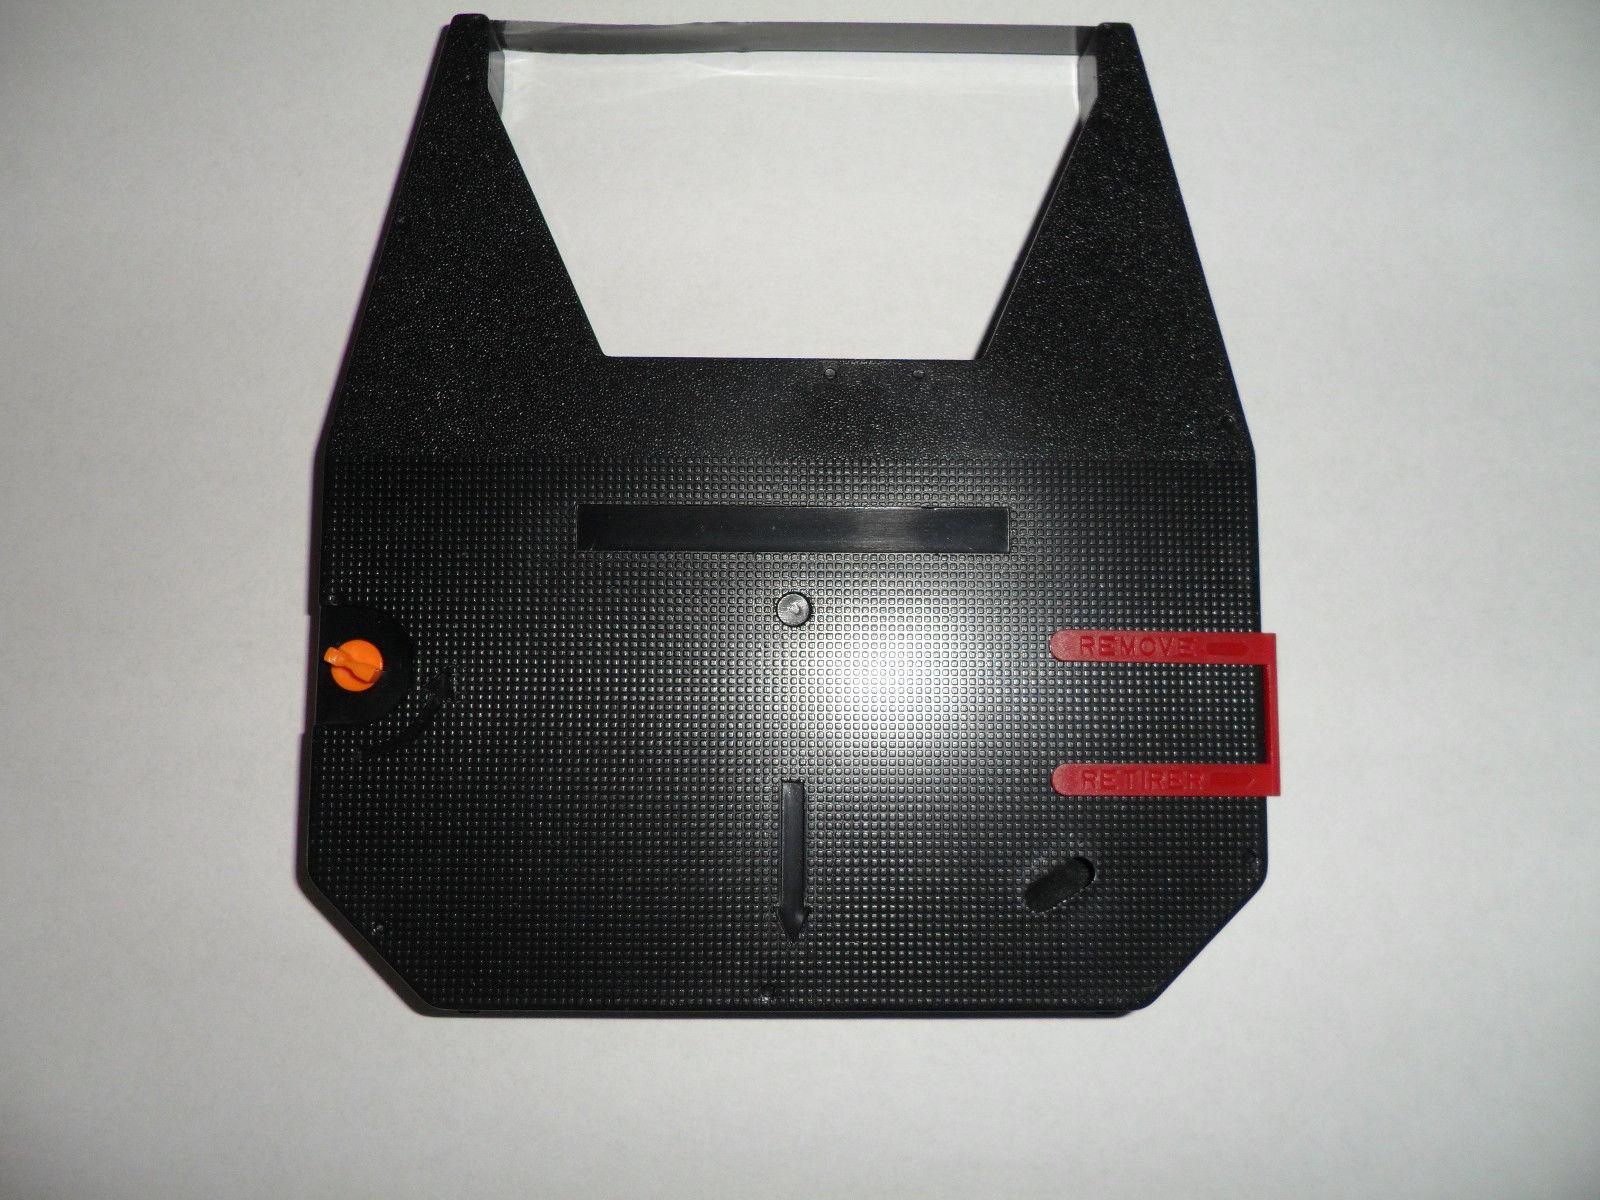 Brother Student Riter XL1 Typewriter Ribbon Replaces 7020 B165 T330